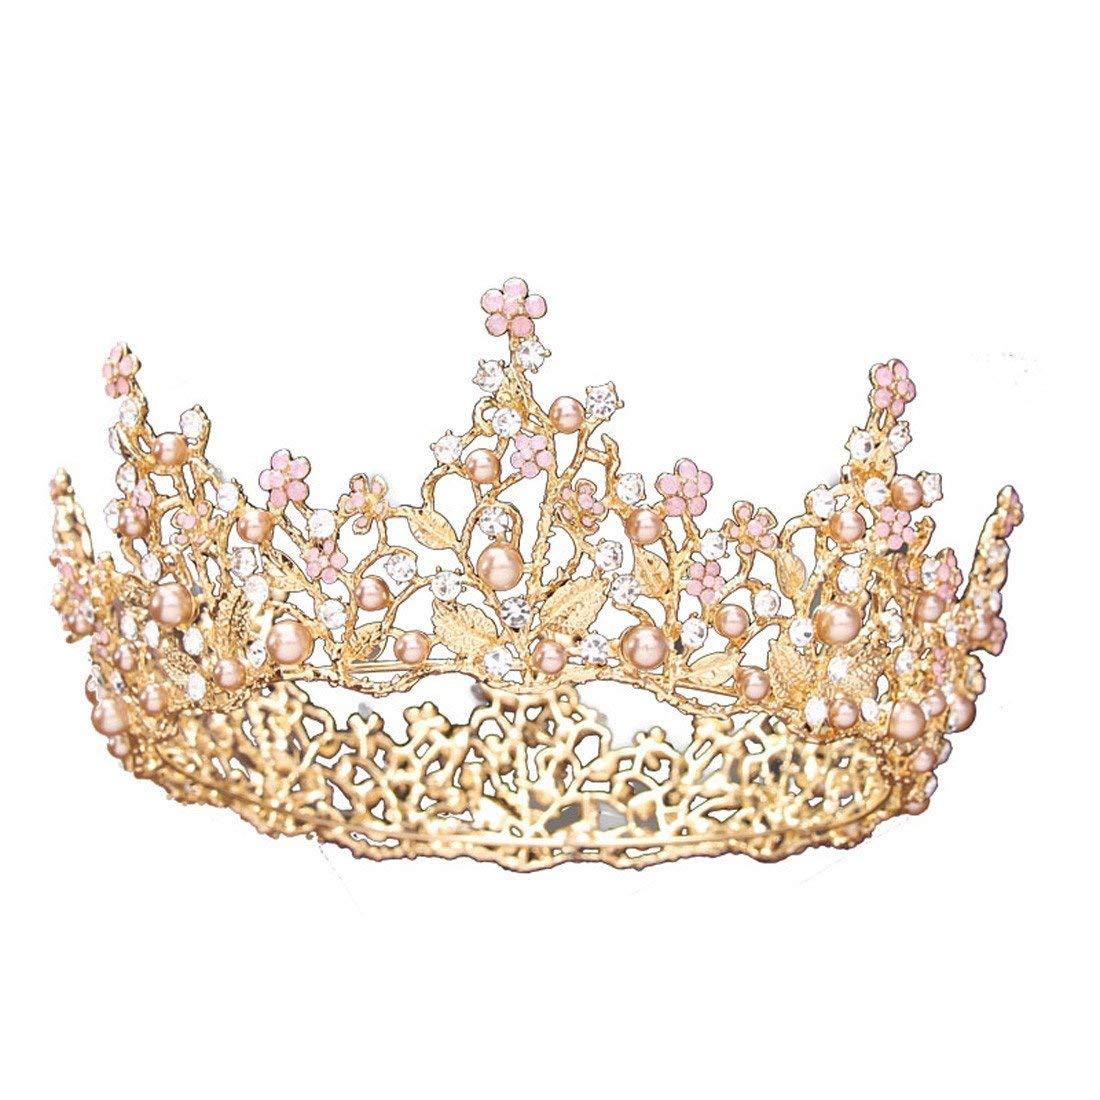 Crystal Crown, Round Crown Atmosphere Noble Queen Golden Crown Bride Wedding Headwear Wedding Dress Accessories.